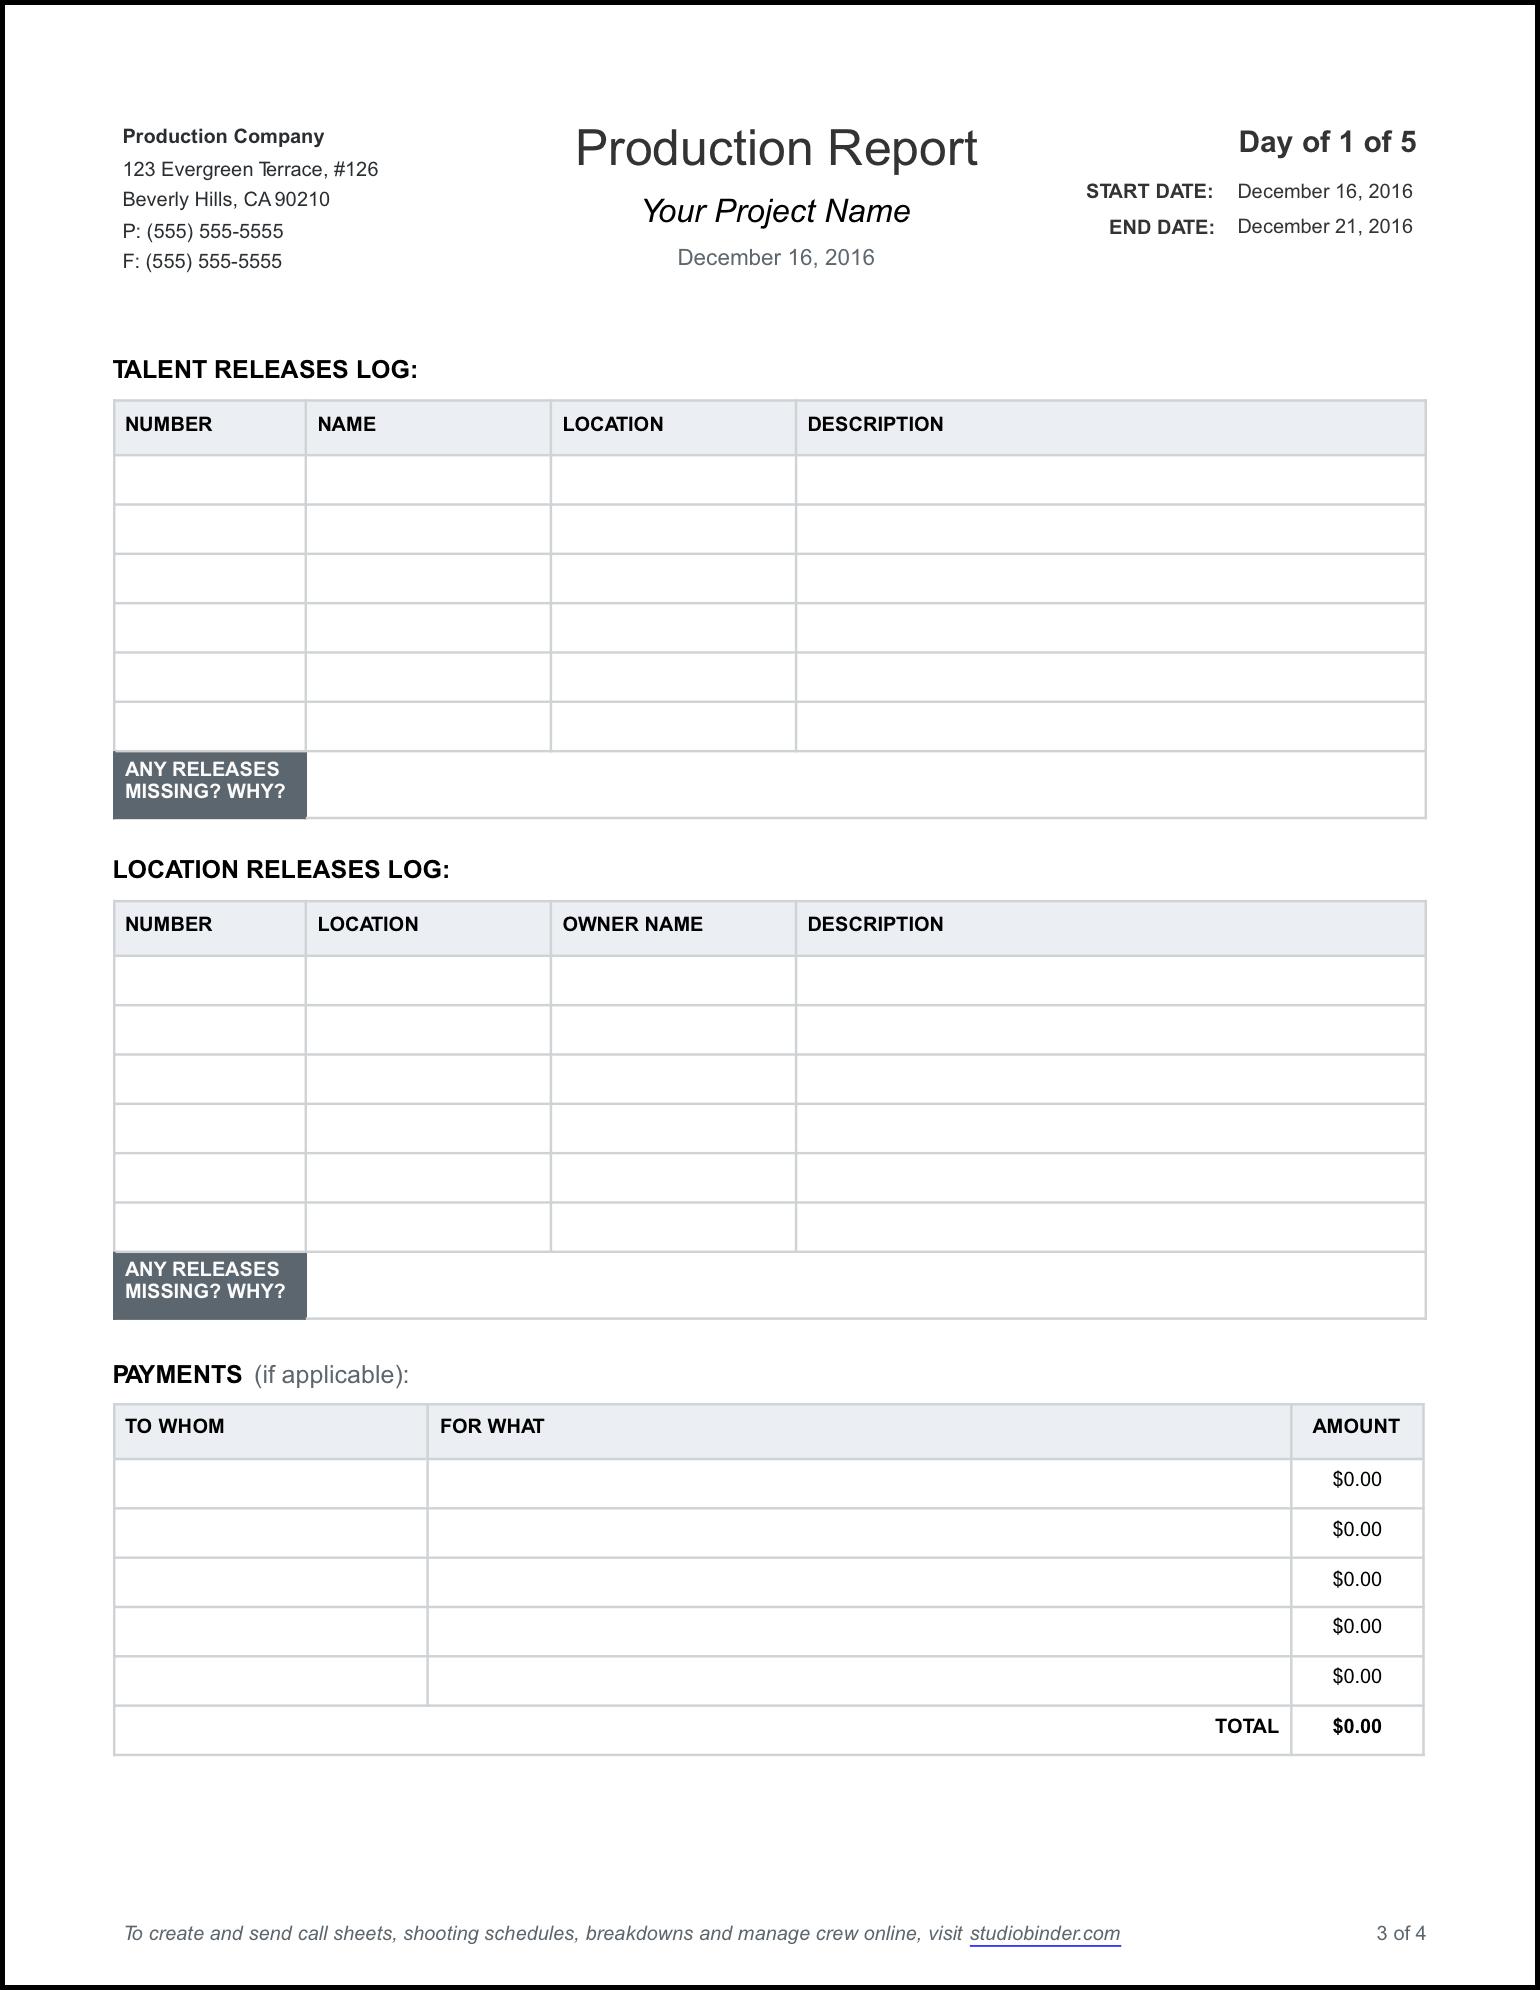 format daily report - Parfu kaptanband co